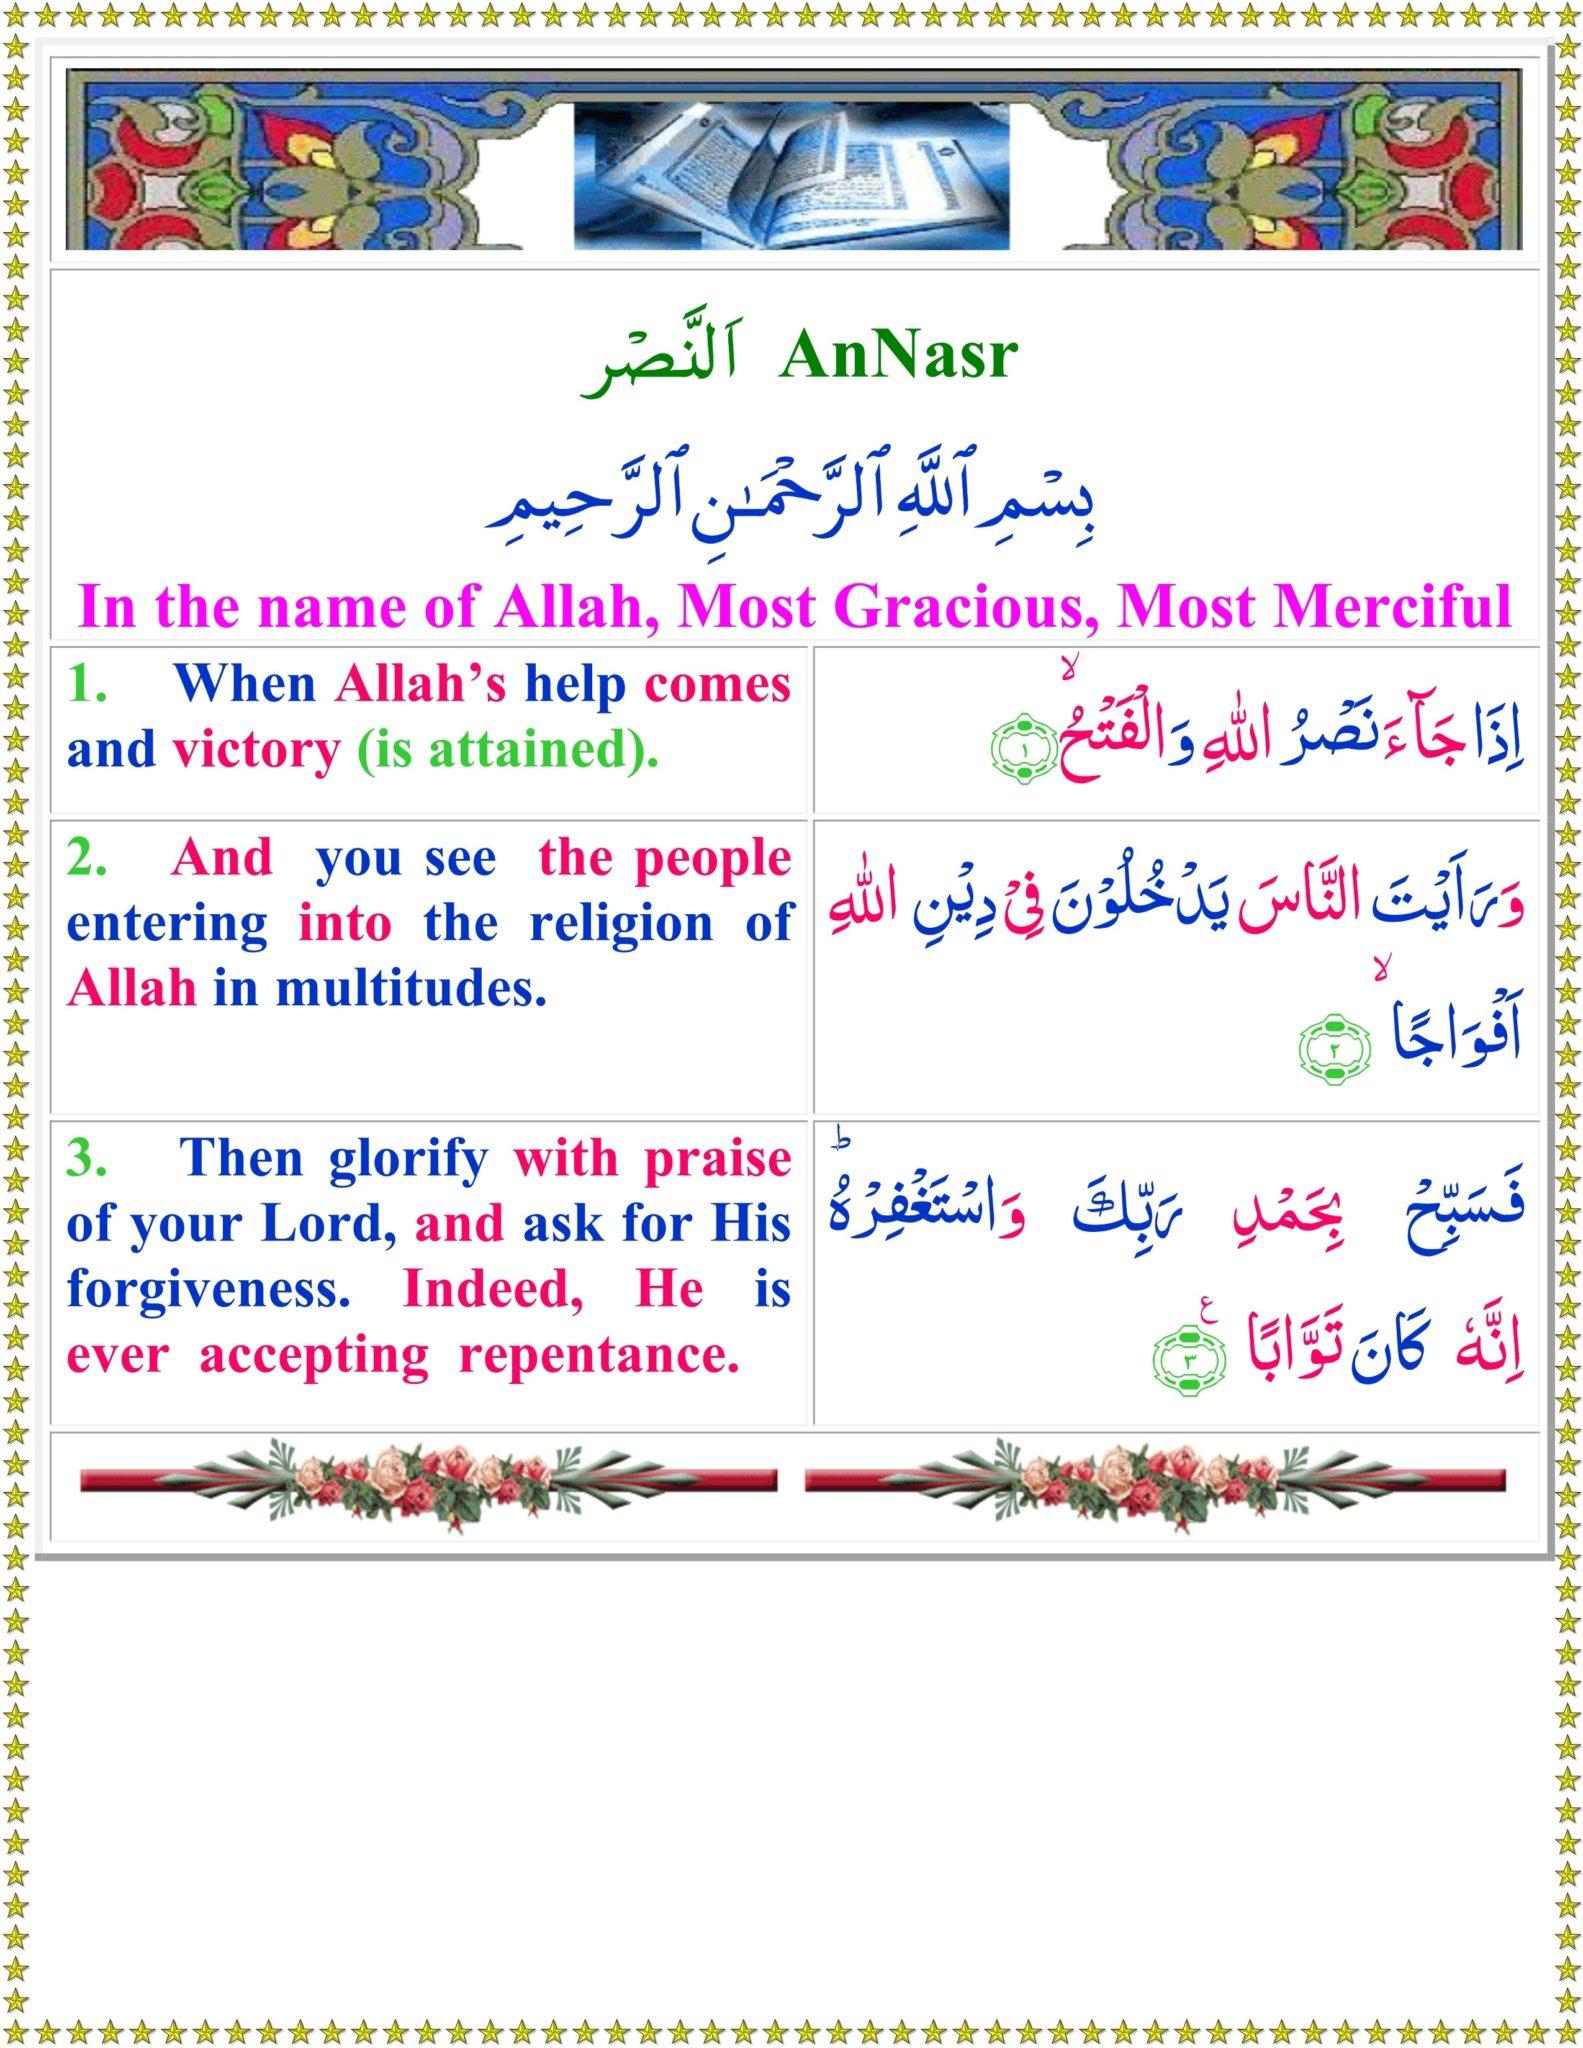 Surah Nasr translation in English